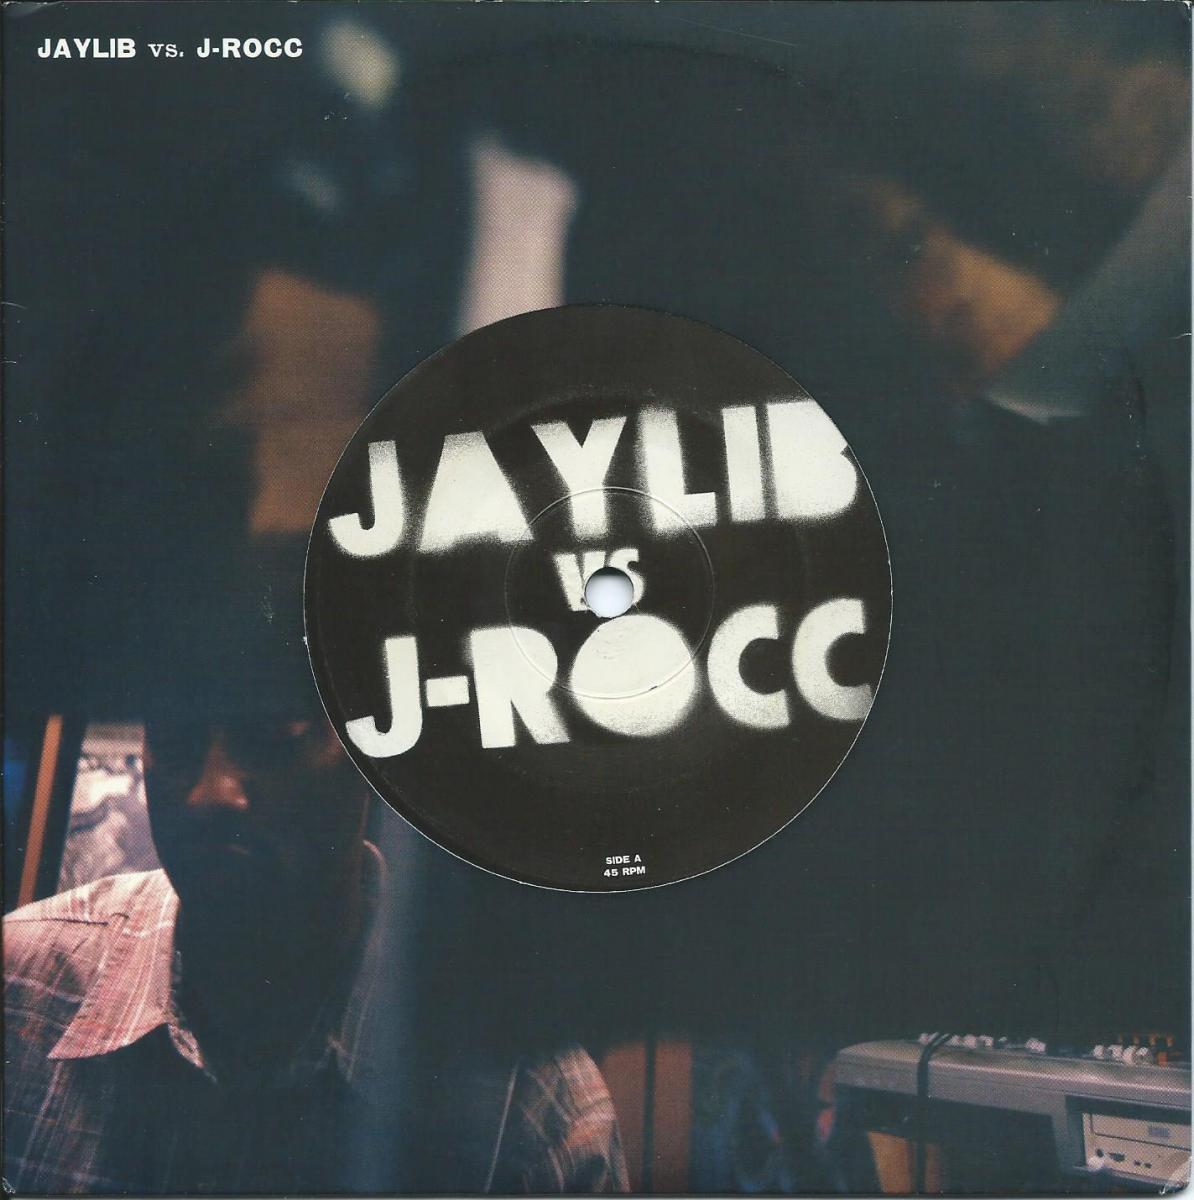 JAYLIB VS. J-ROCC / JAYLIB VS. J-ROCC (7